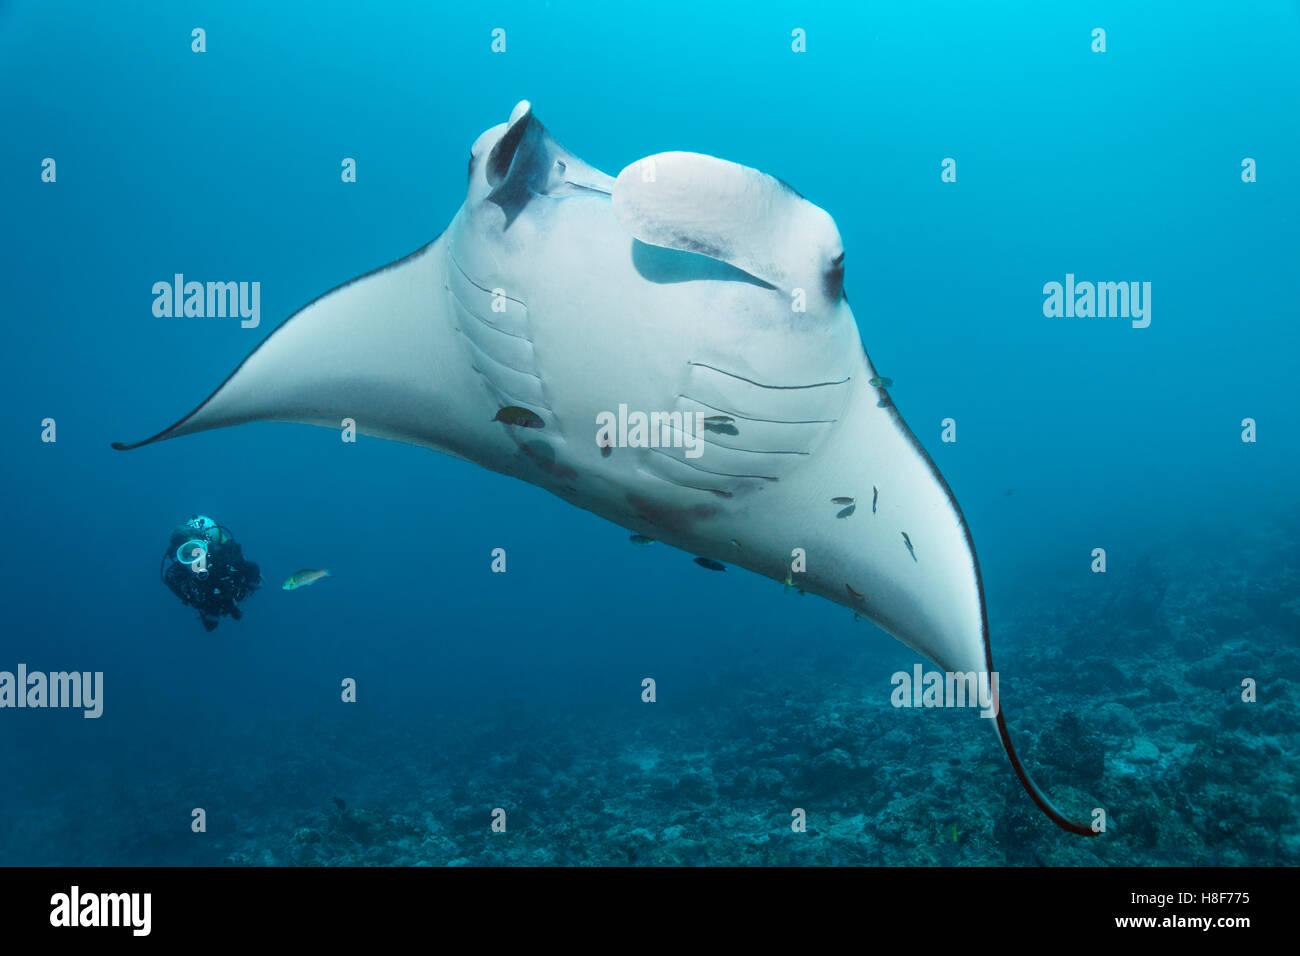 Diver observing reef manta ray (Manta alfredi), coral reef, Indian Ocean, Maldives - Stock Image